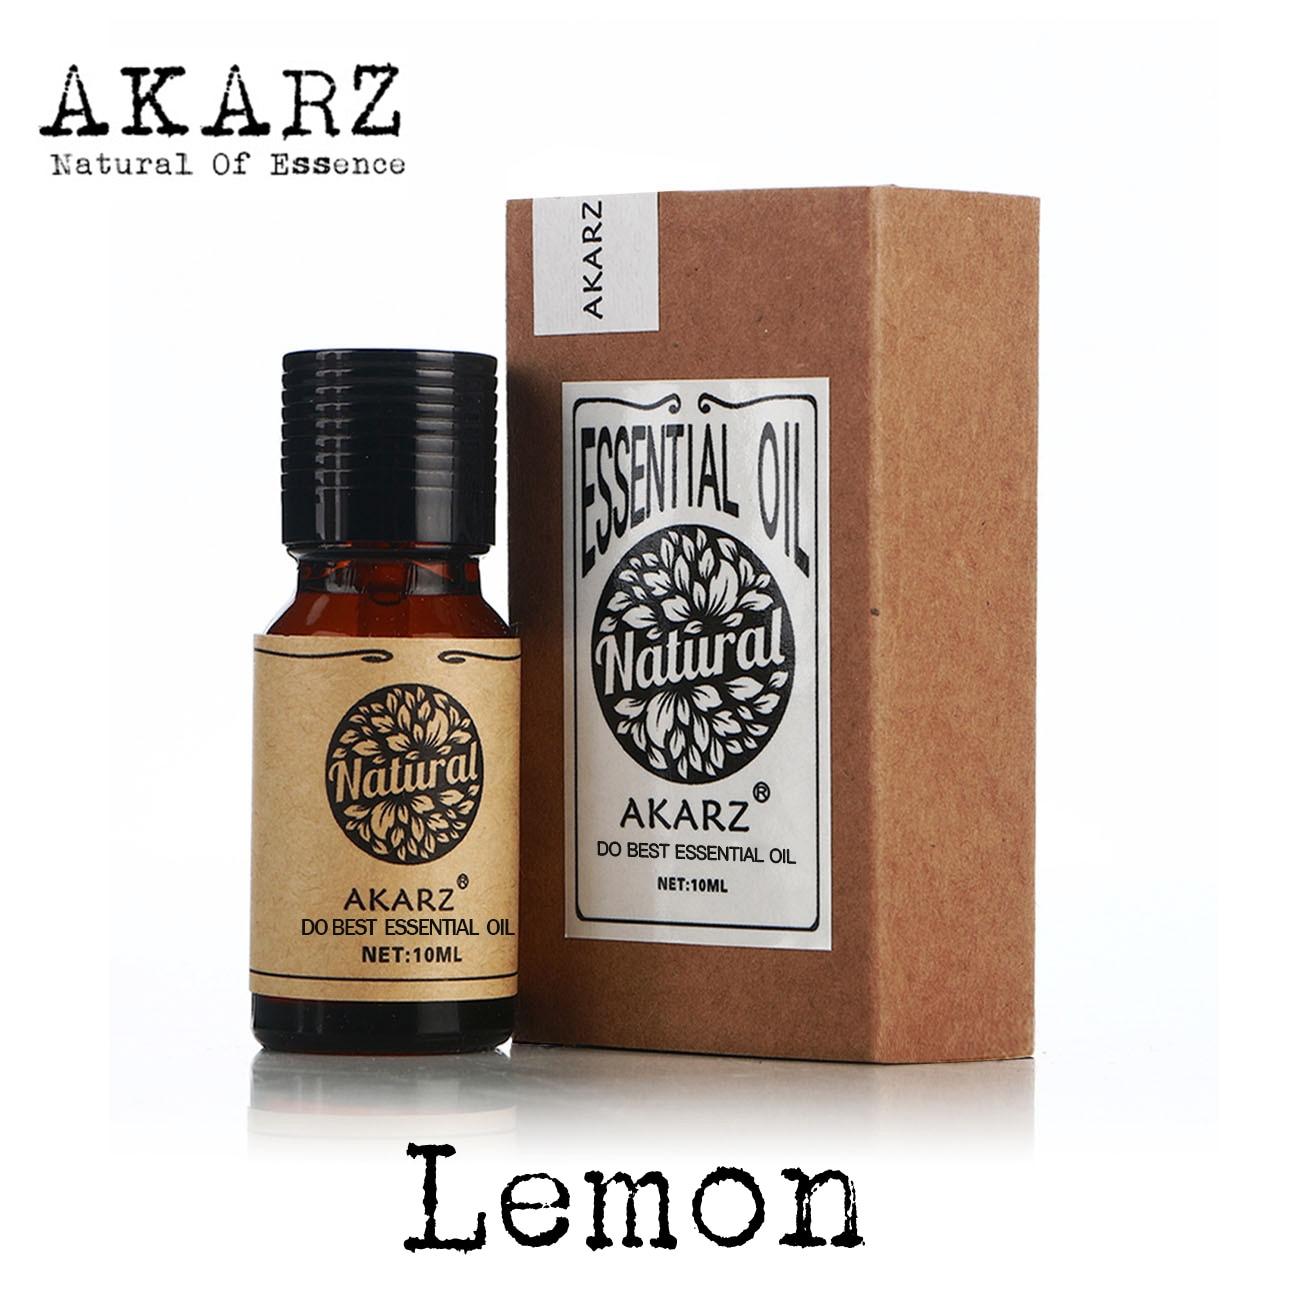 AKARZ Famous brand free shipping natural aromatherapy Lemon Essential Oil Skin whitening Remove halitosis Clean air Lemon Oil two packs of jiangsu anhui shipping matsuki eijisa 6l 2 82kg lemon pine natural deodorant